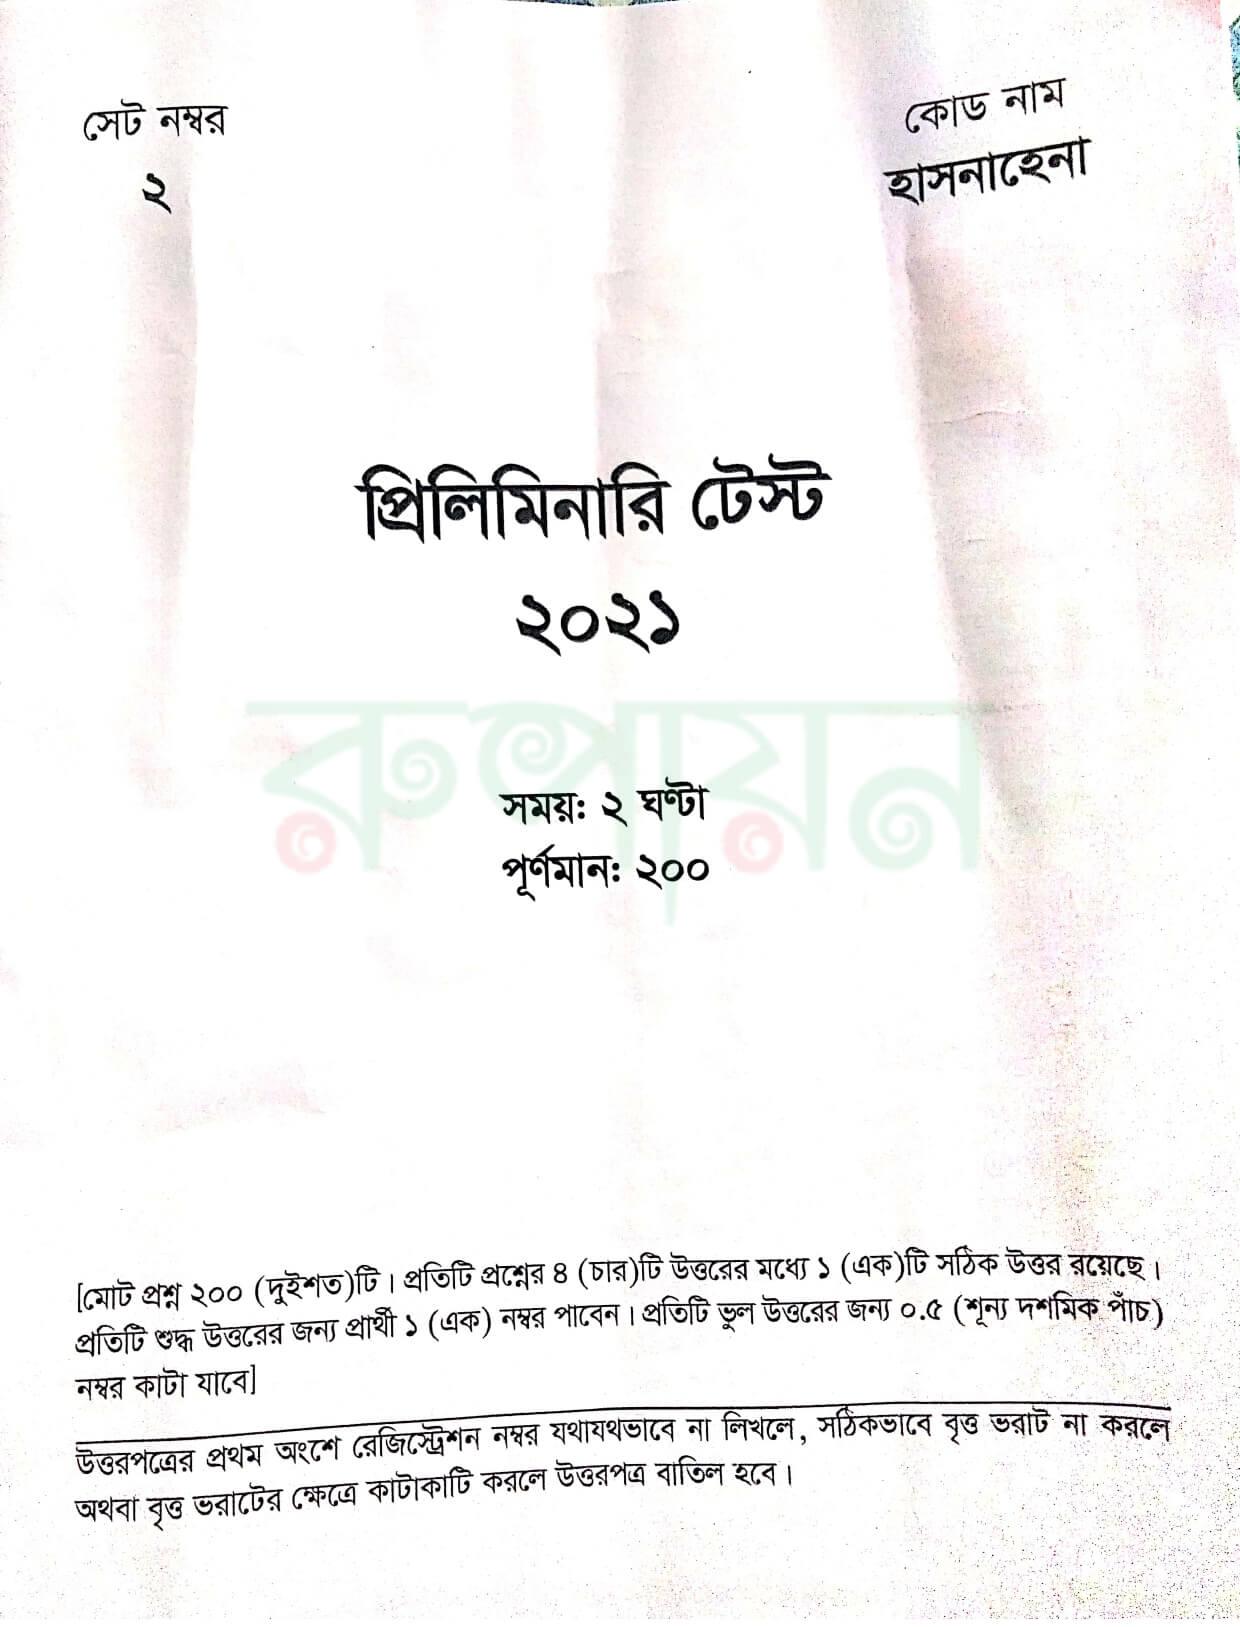 41 BCS Question Paper 1